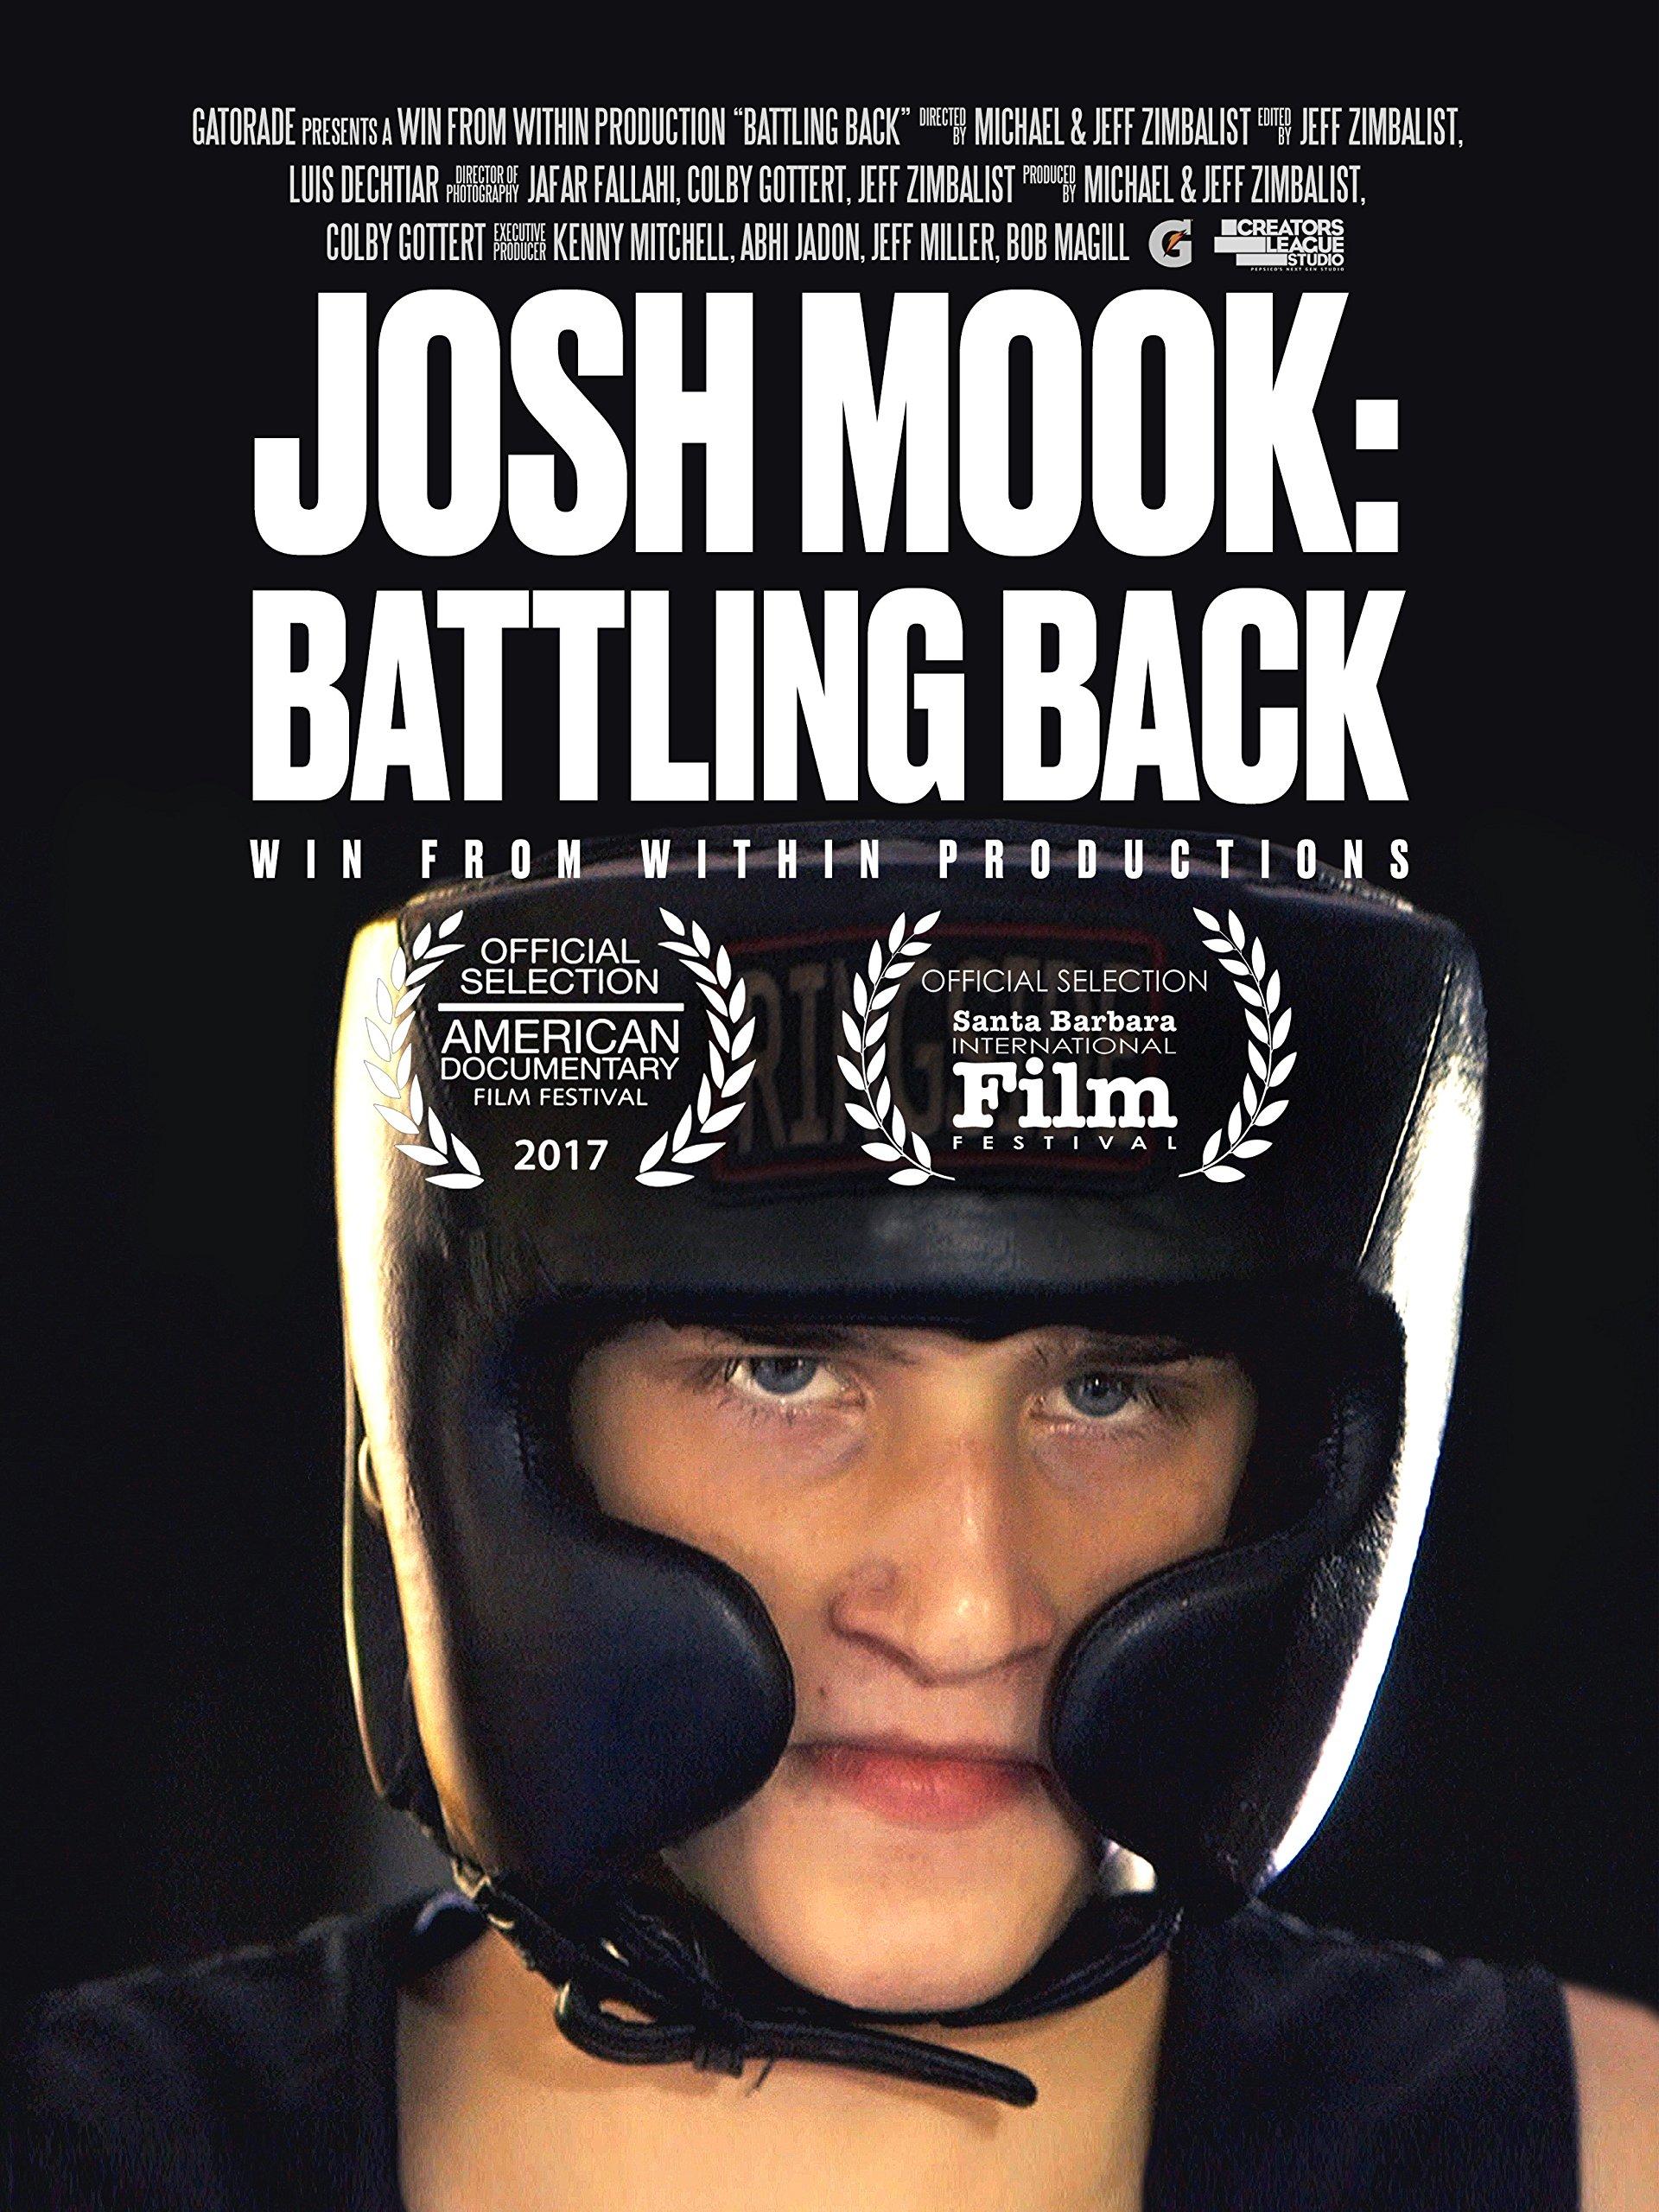 Josh Mook: Battling Back